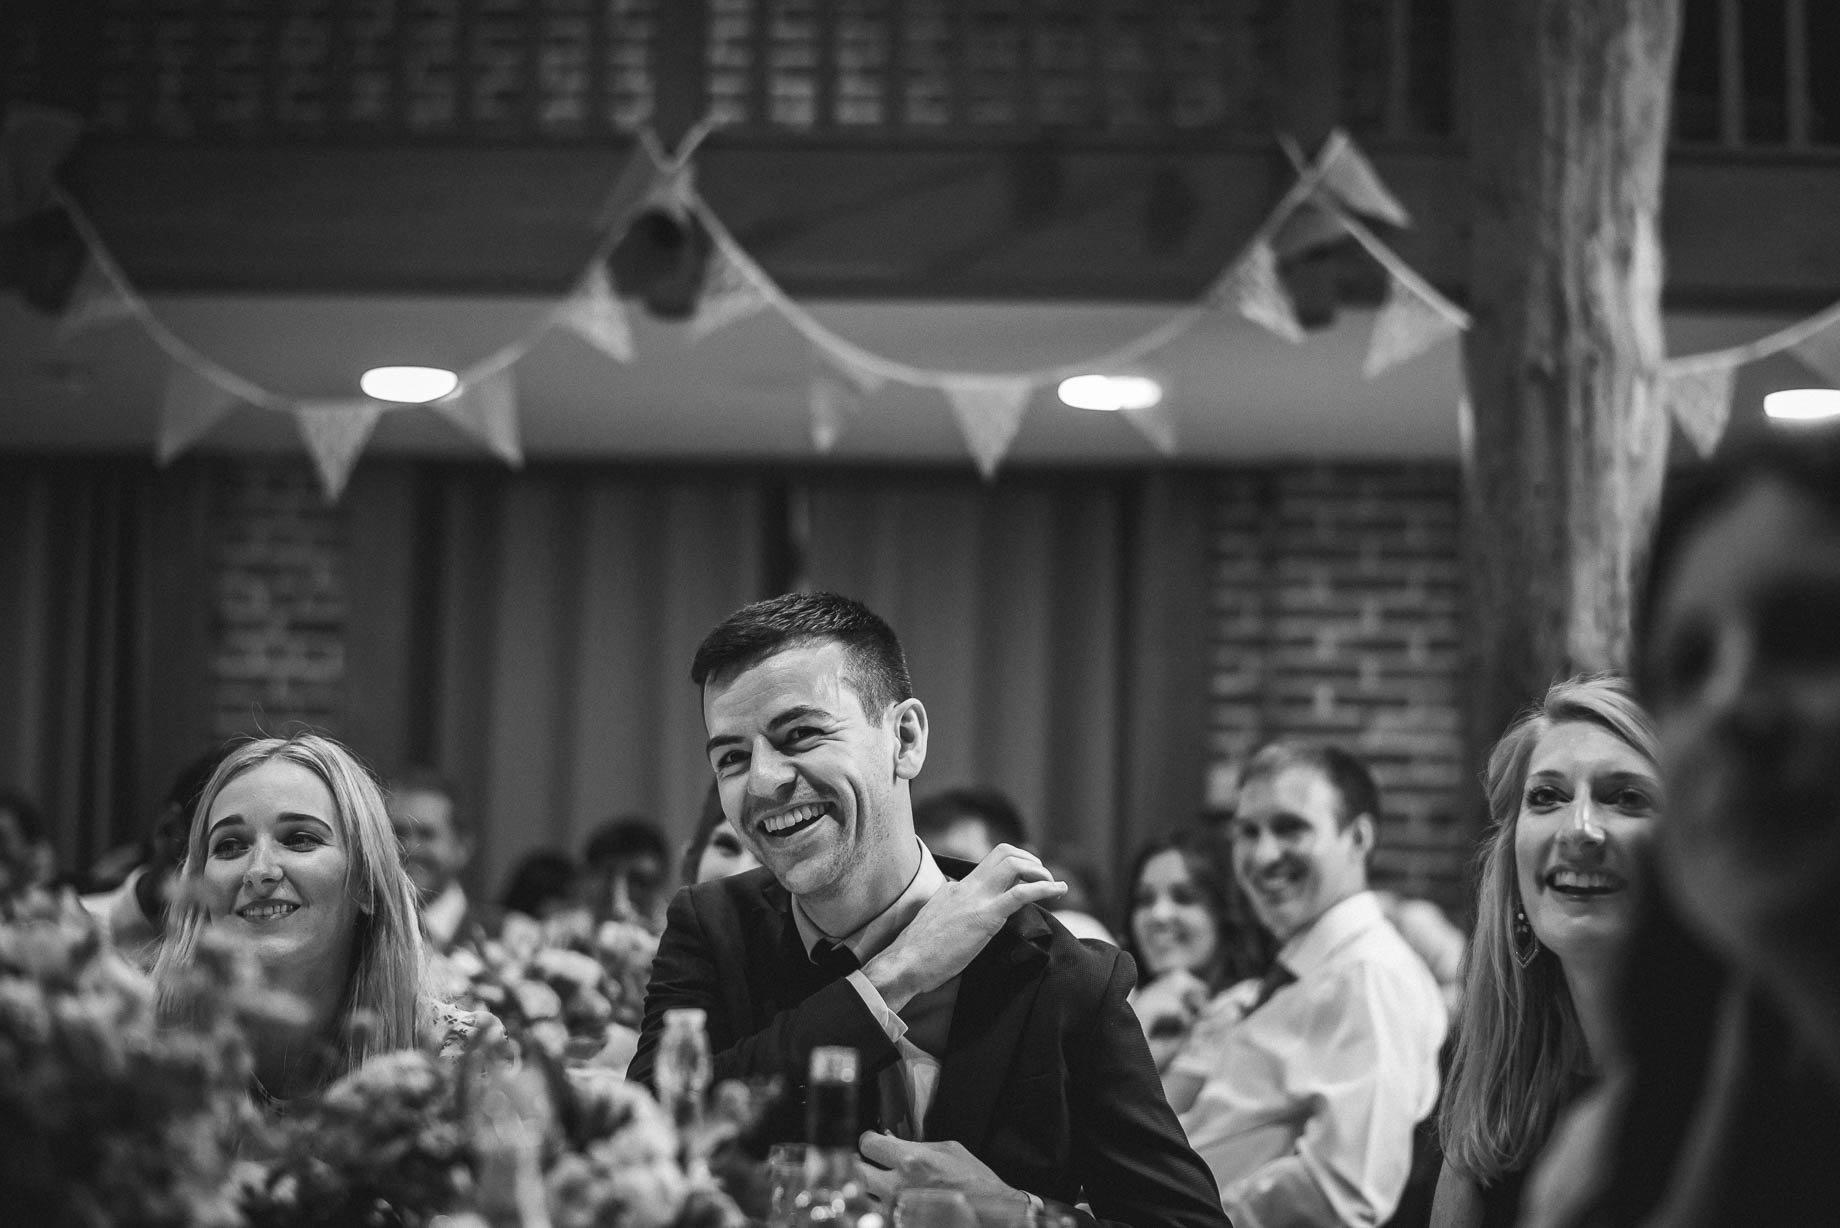 Gaynes Park wedding photography - Guy Collier Photography - Rachel and Jon (127 of 169)